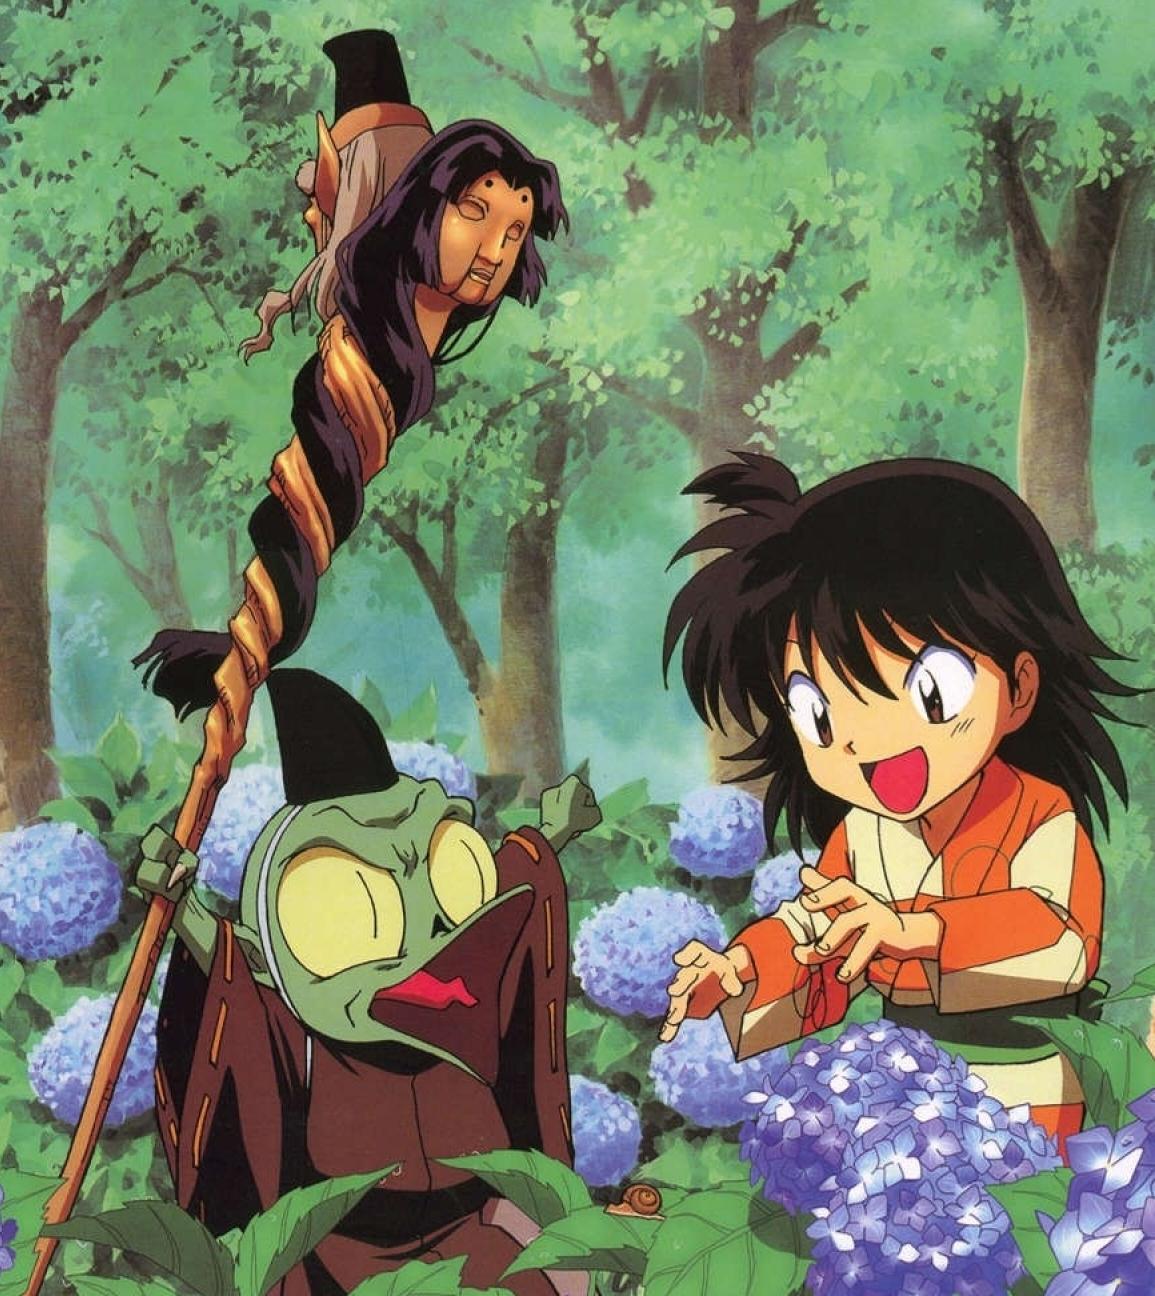 Inuyasha Episode Jaken Meets Sesshomaru / Season 3 Episode